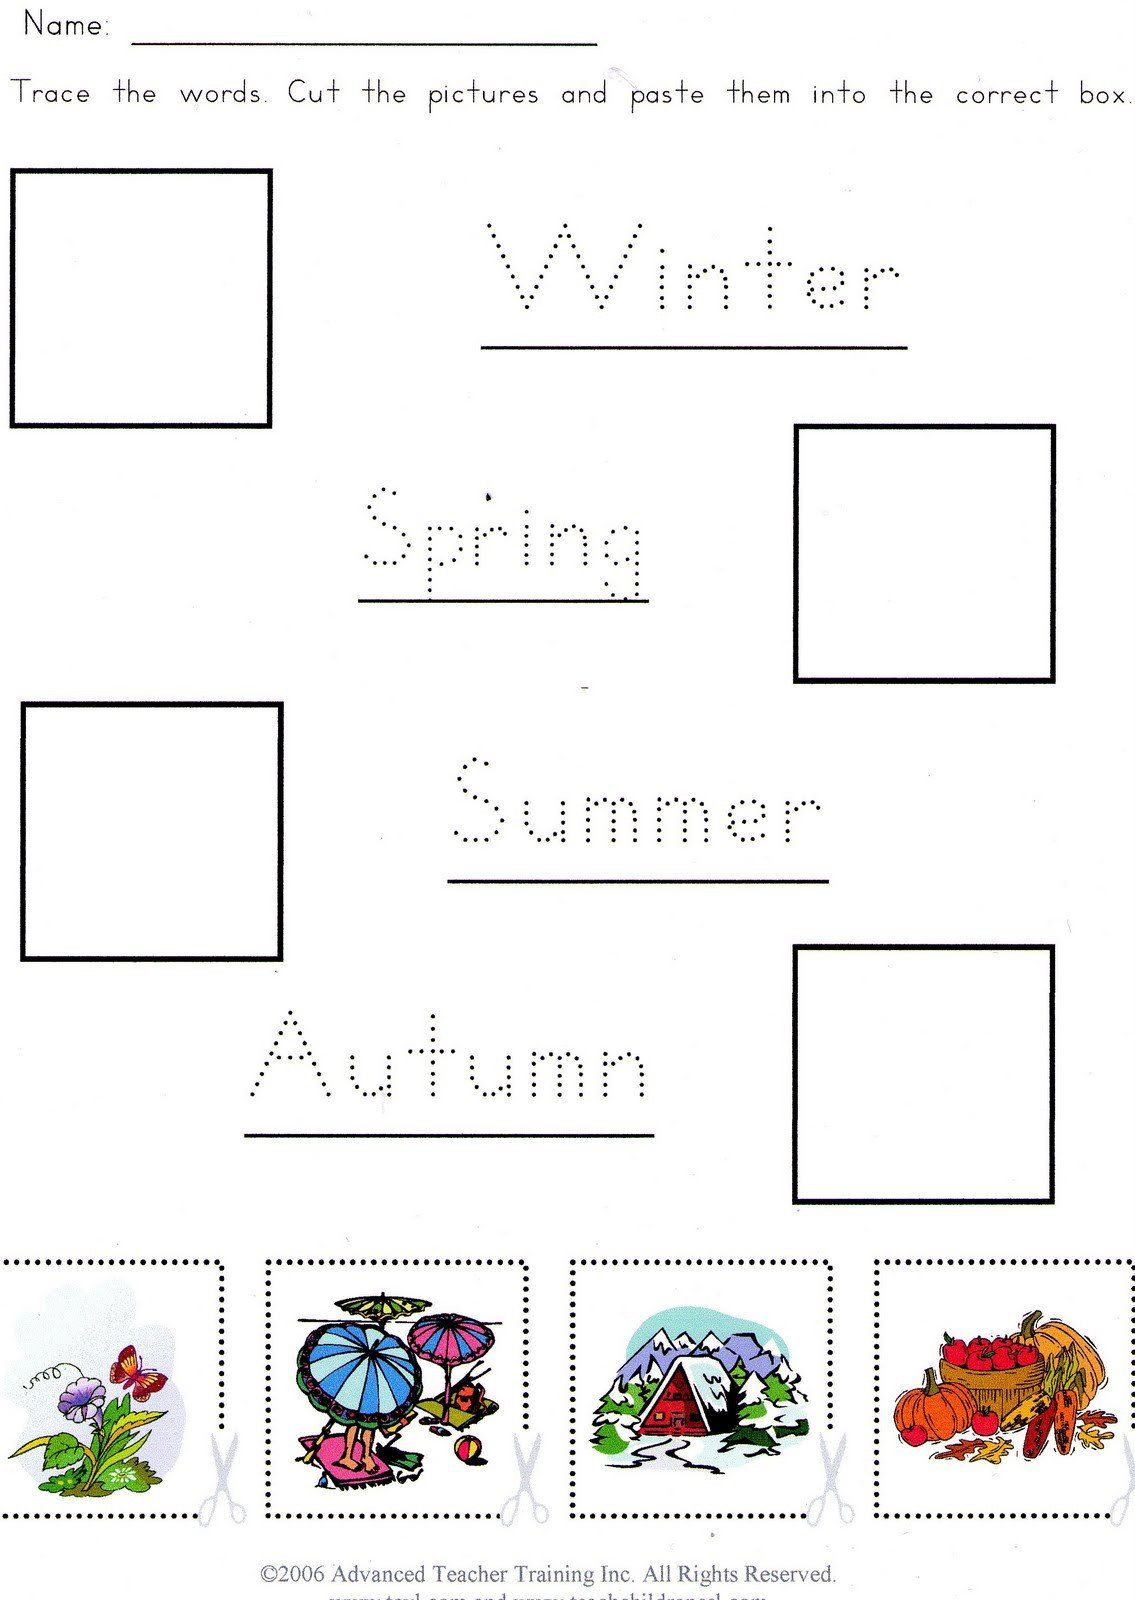 Predownload: Four Seasons Kindergarten Worksheets Seasons Unit 1st Grade Lessons Tes Teach Kindergarten Worksheets Printable Seasons Worksheets Seasons Kindergarten [ 1600 x 1135 Pixel ]